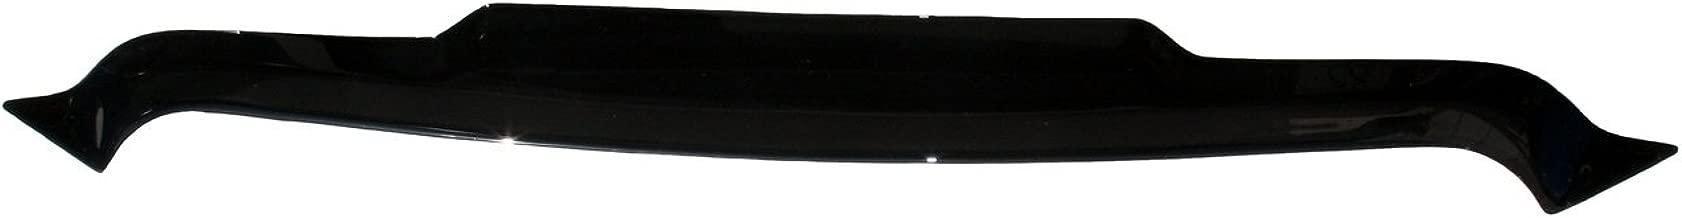 Auto Ventshade 322004 Aeroskin Flush Mount Dark Smoke Hood Protector for 2009-2018 Dodge 1500 (Excludes Sport & Rebel); 2019 Ram 1500 Classic